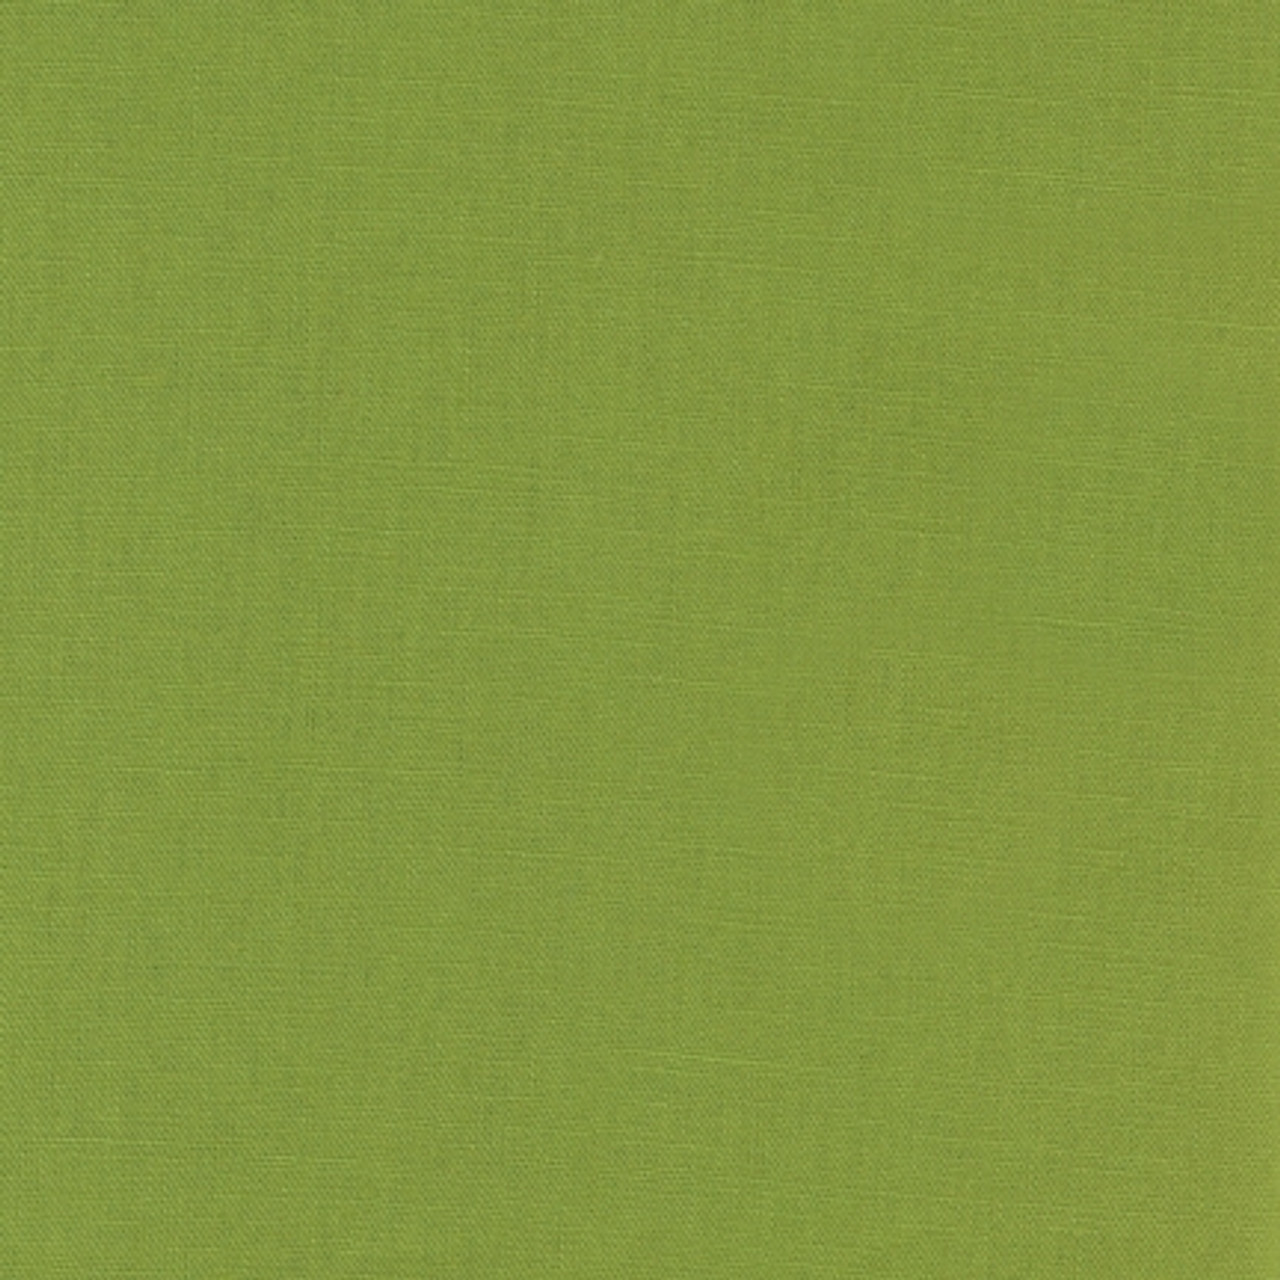 Essex Linen - Lime